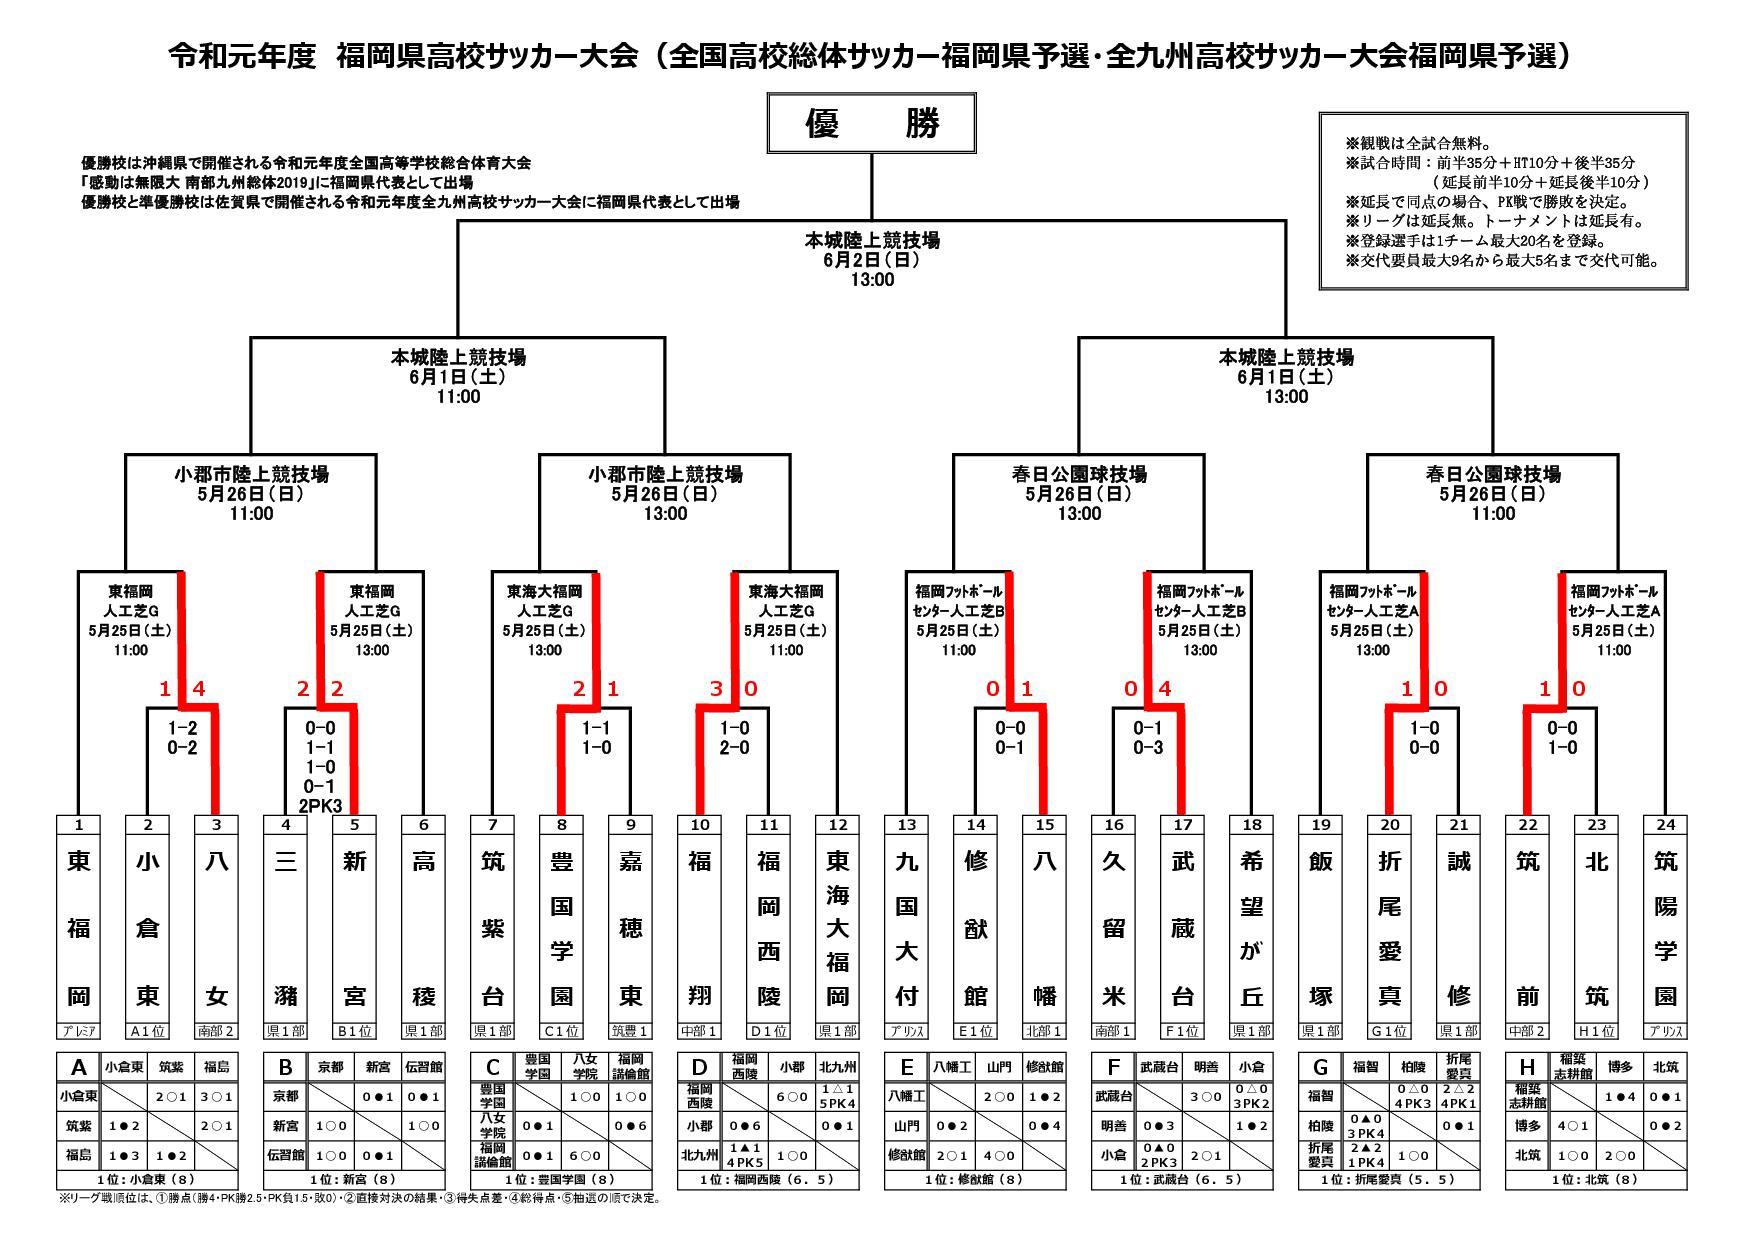 令和元年度福岡県高校サッカー大会